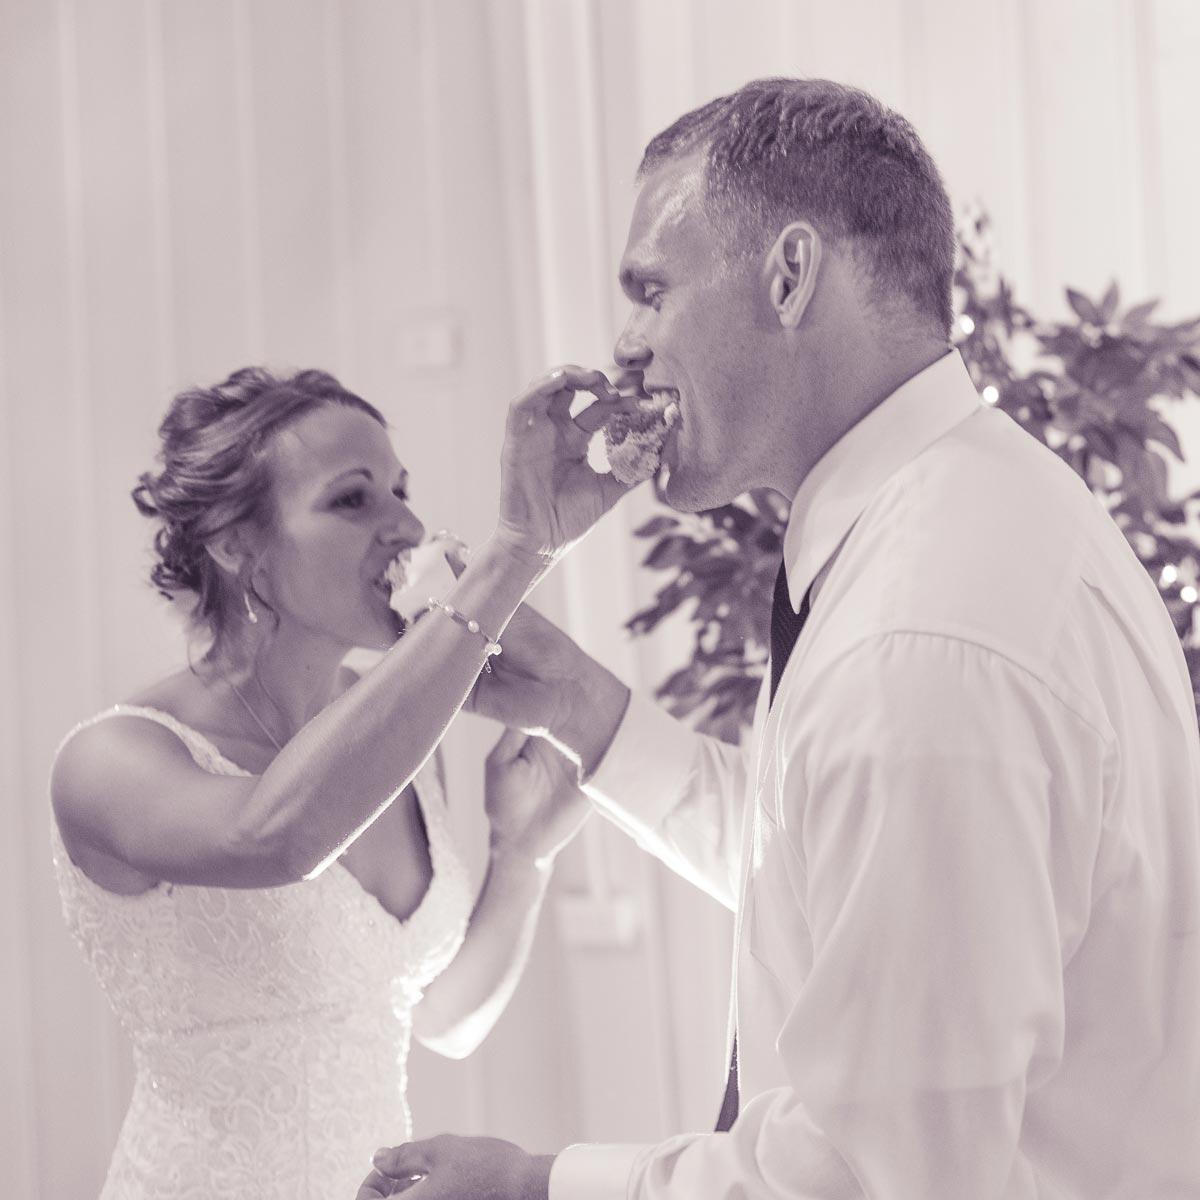 evansville-wedding-photographer-pabst-photo-kokies-echo-valley-(88)